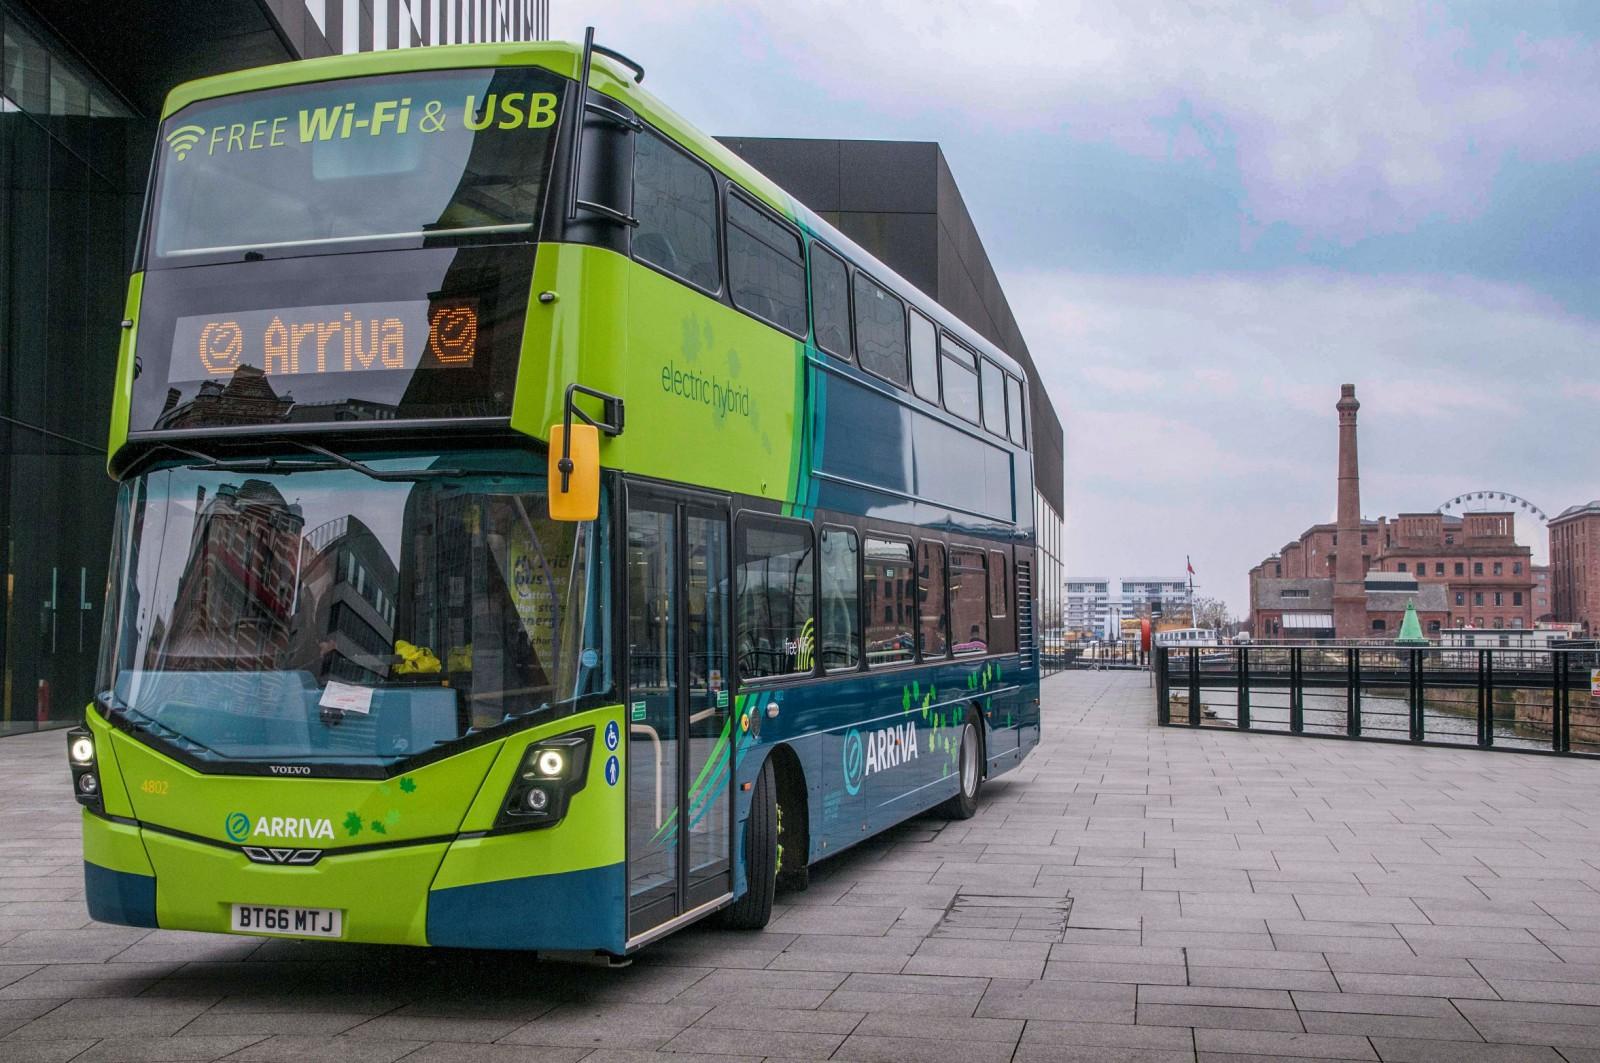 New Arriva Hybrid double decker buses announcement at Mann Island.